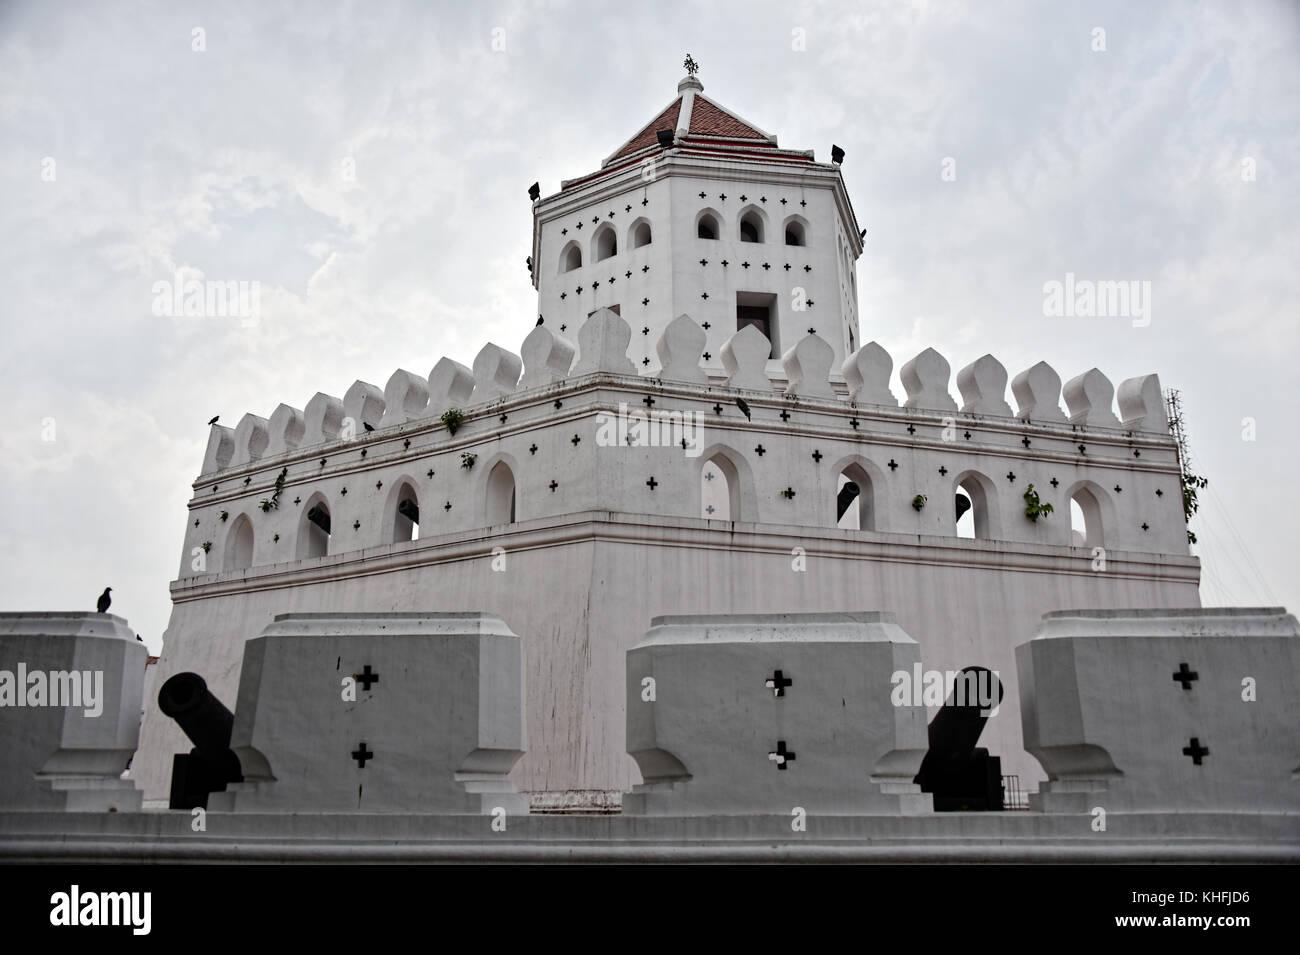 Phra Arthit Fort, Bangkok, Thailand - Stock Image